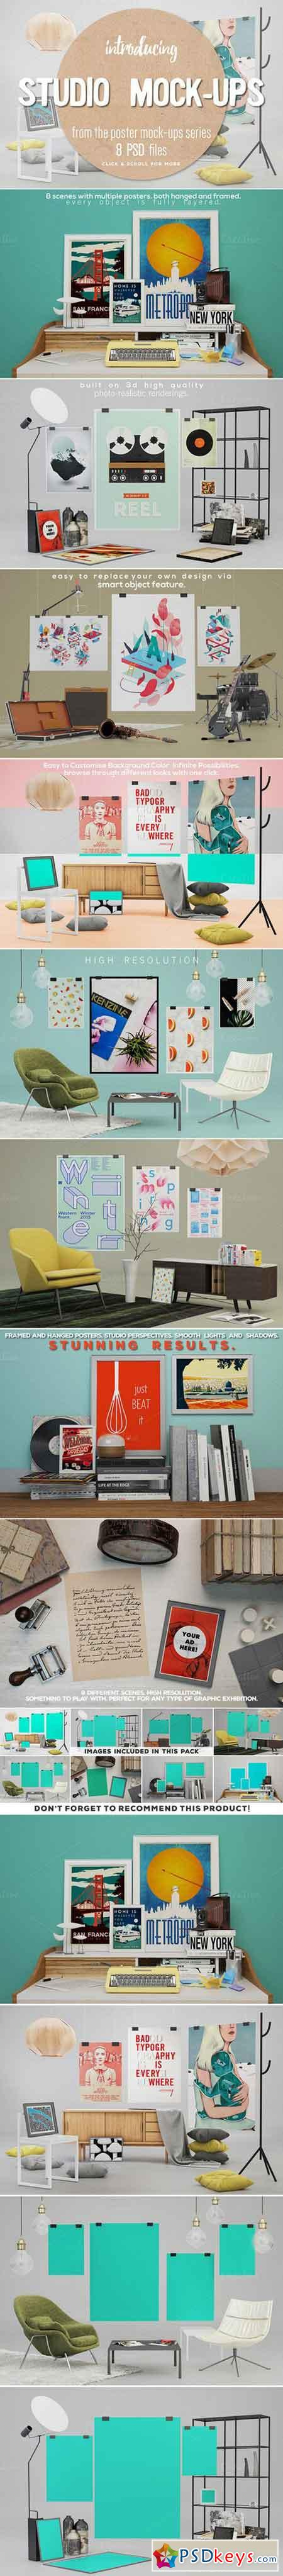 8 Studio Poster Mock-ups 418350